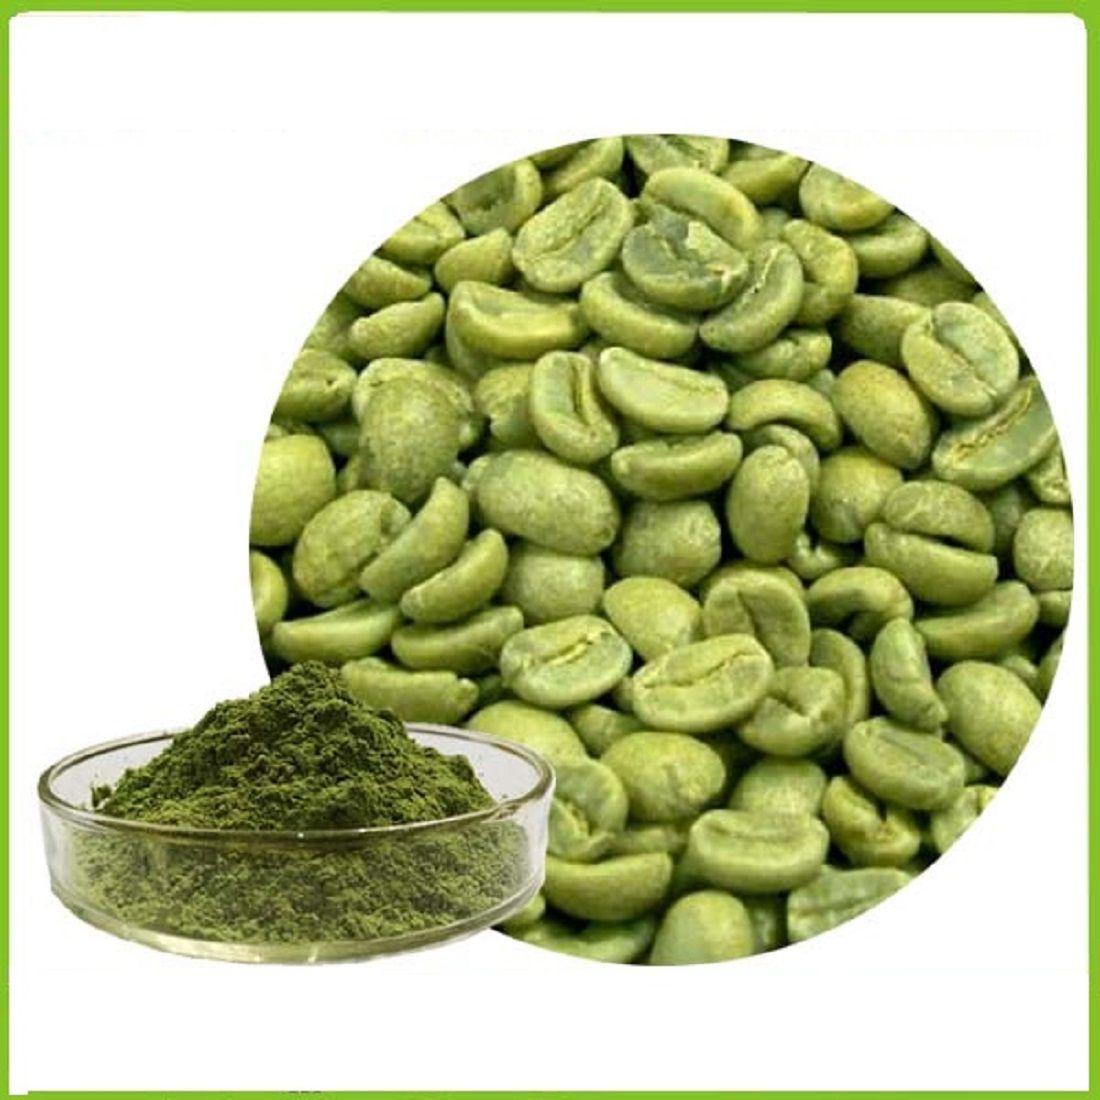 mycure Organic Green Coffee Beans Powder 400 x 2 Grams 800..